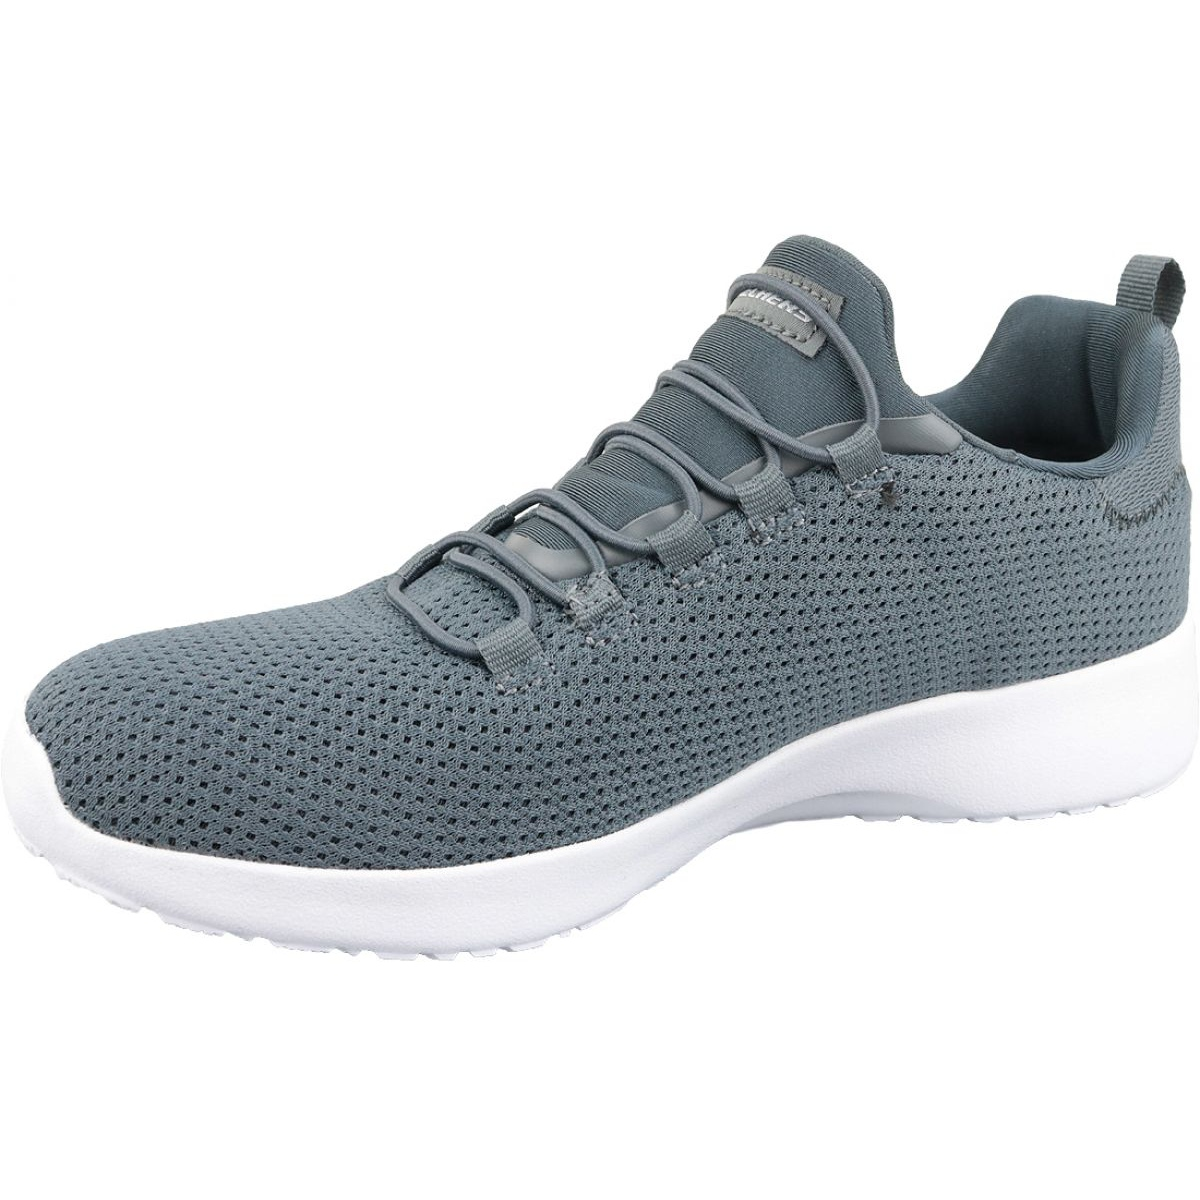 Details zu Skechers Dynamight M 58360 GRY Schuhe grau